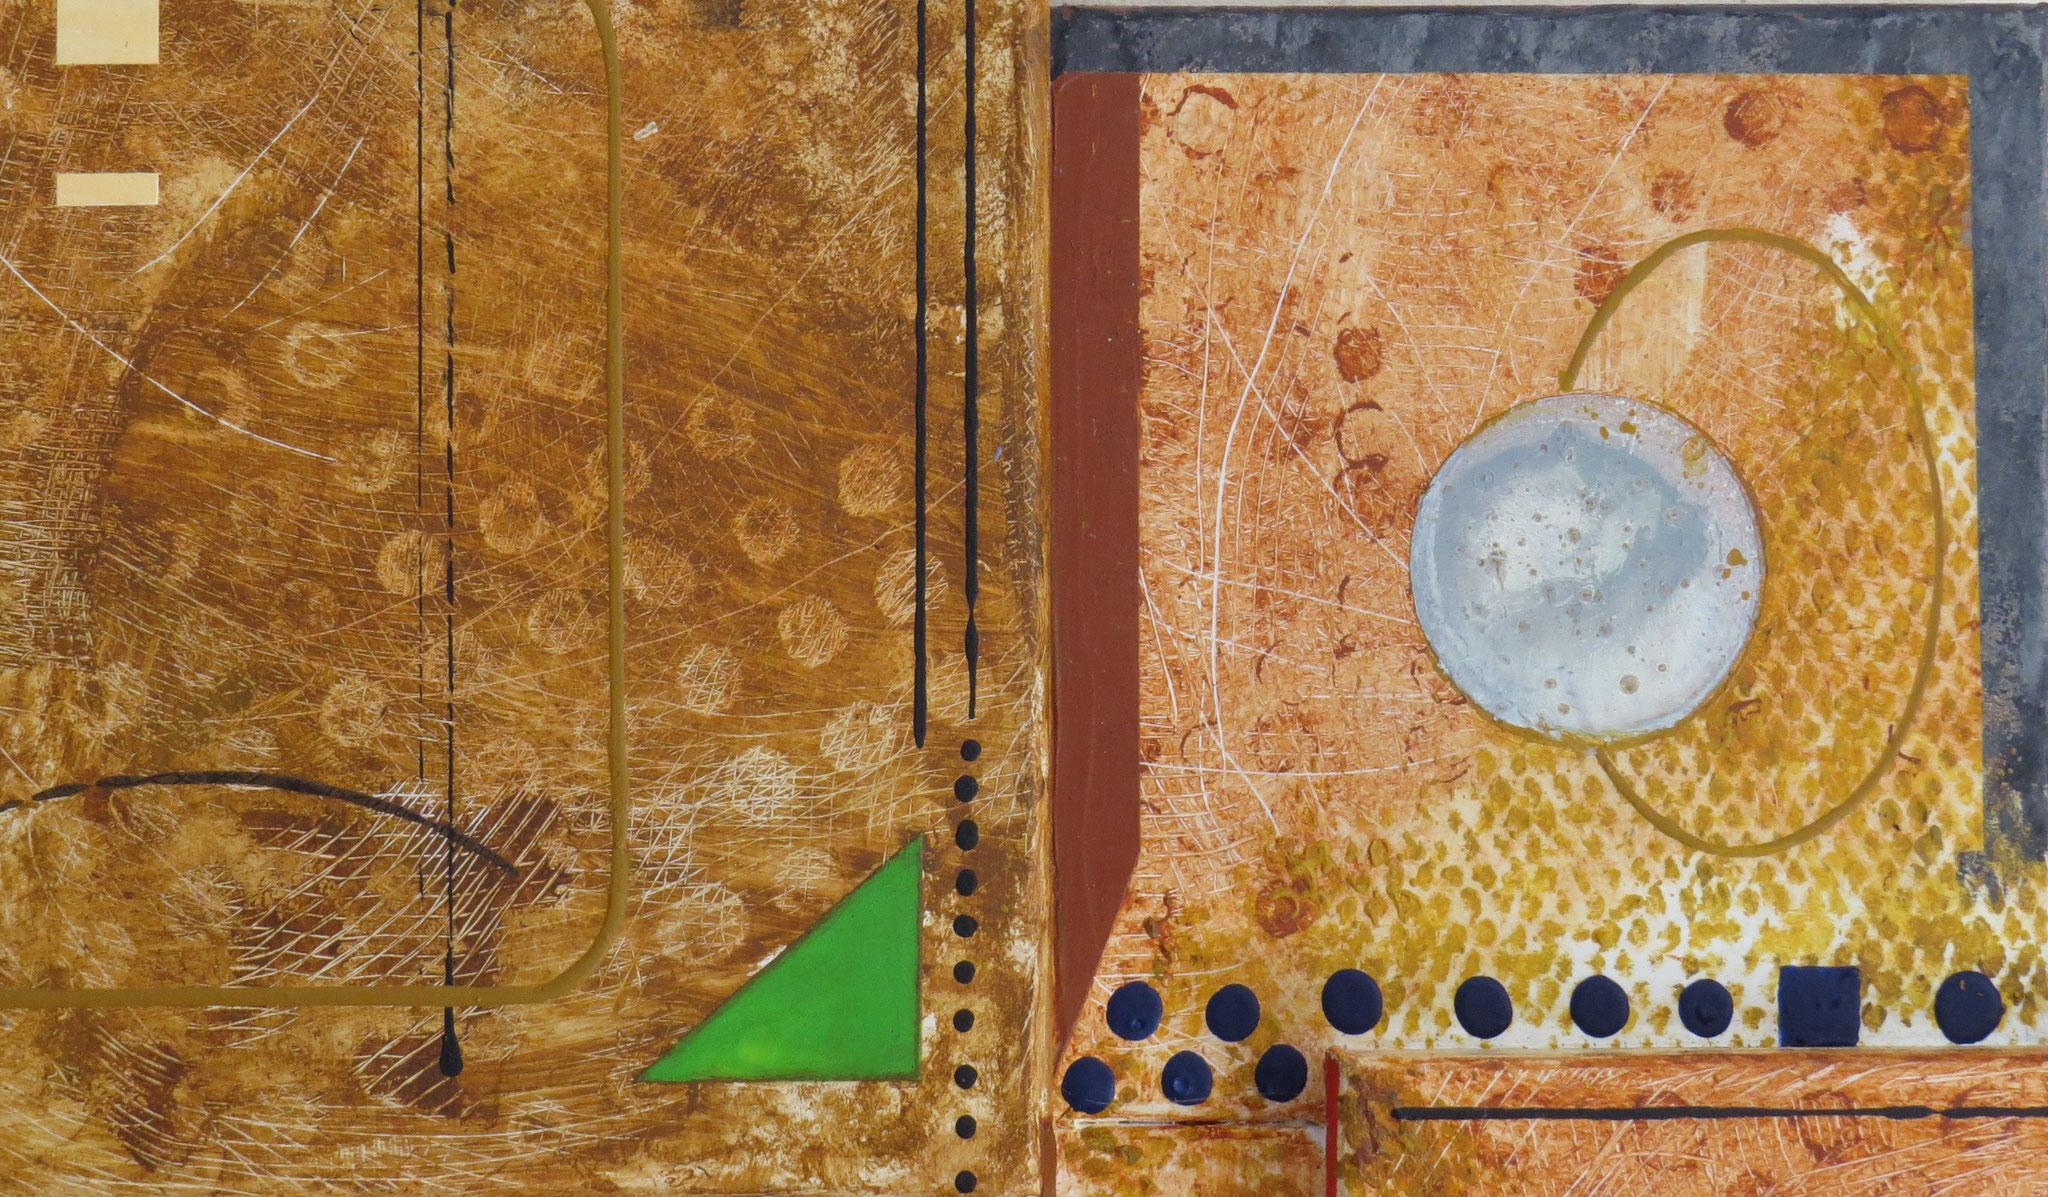 syncrétisme. vue de zoom3 - daluz galego tableau abstrait abstraction